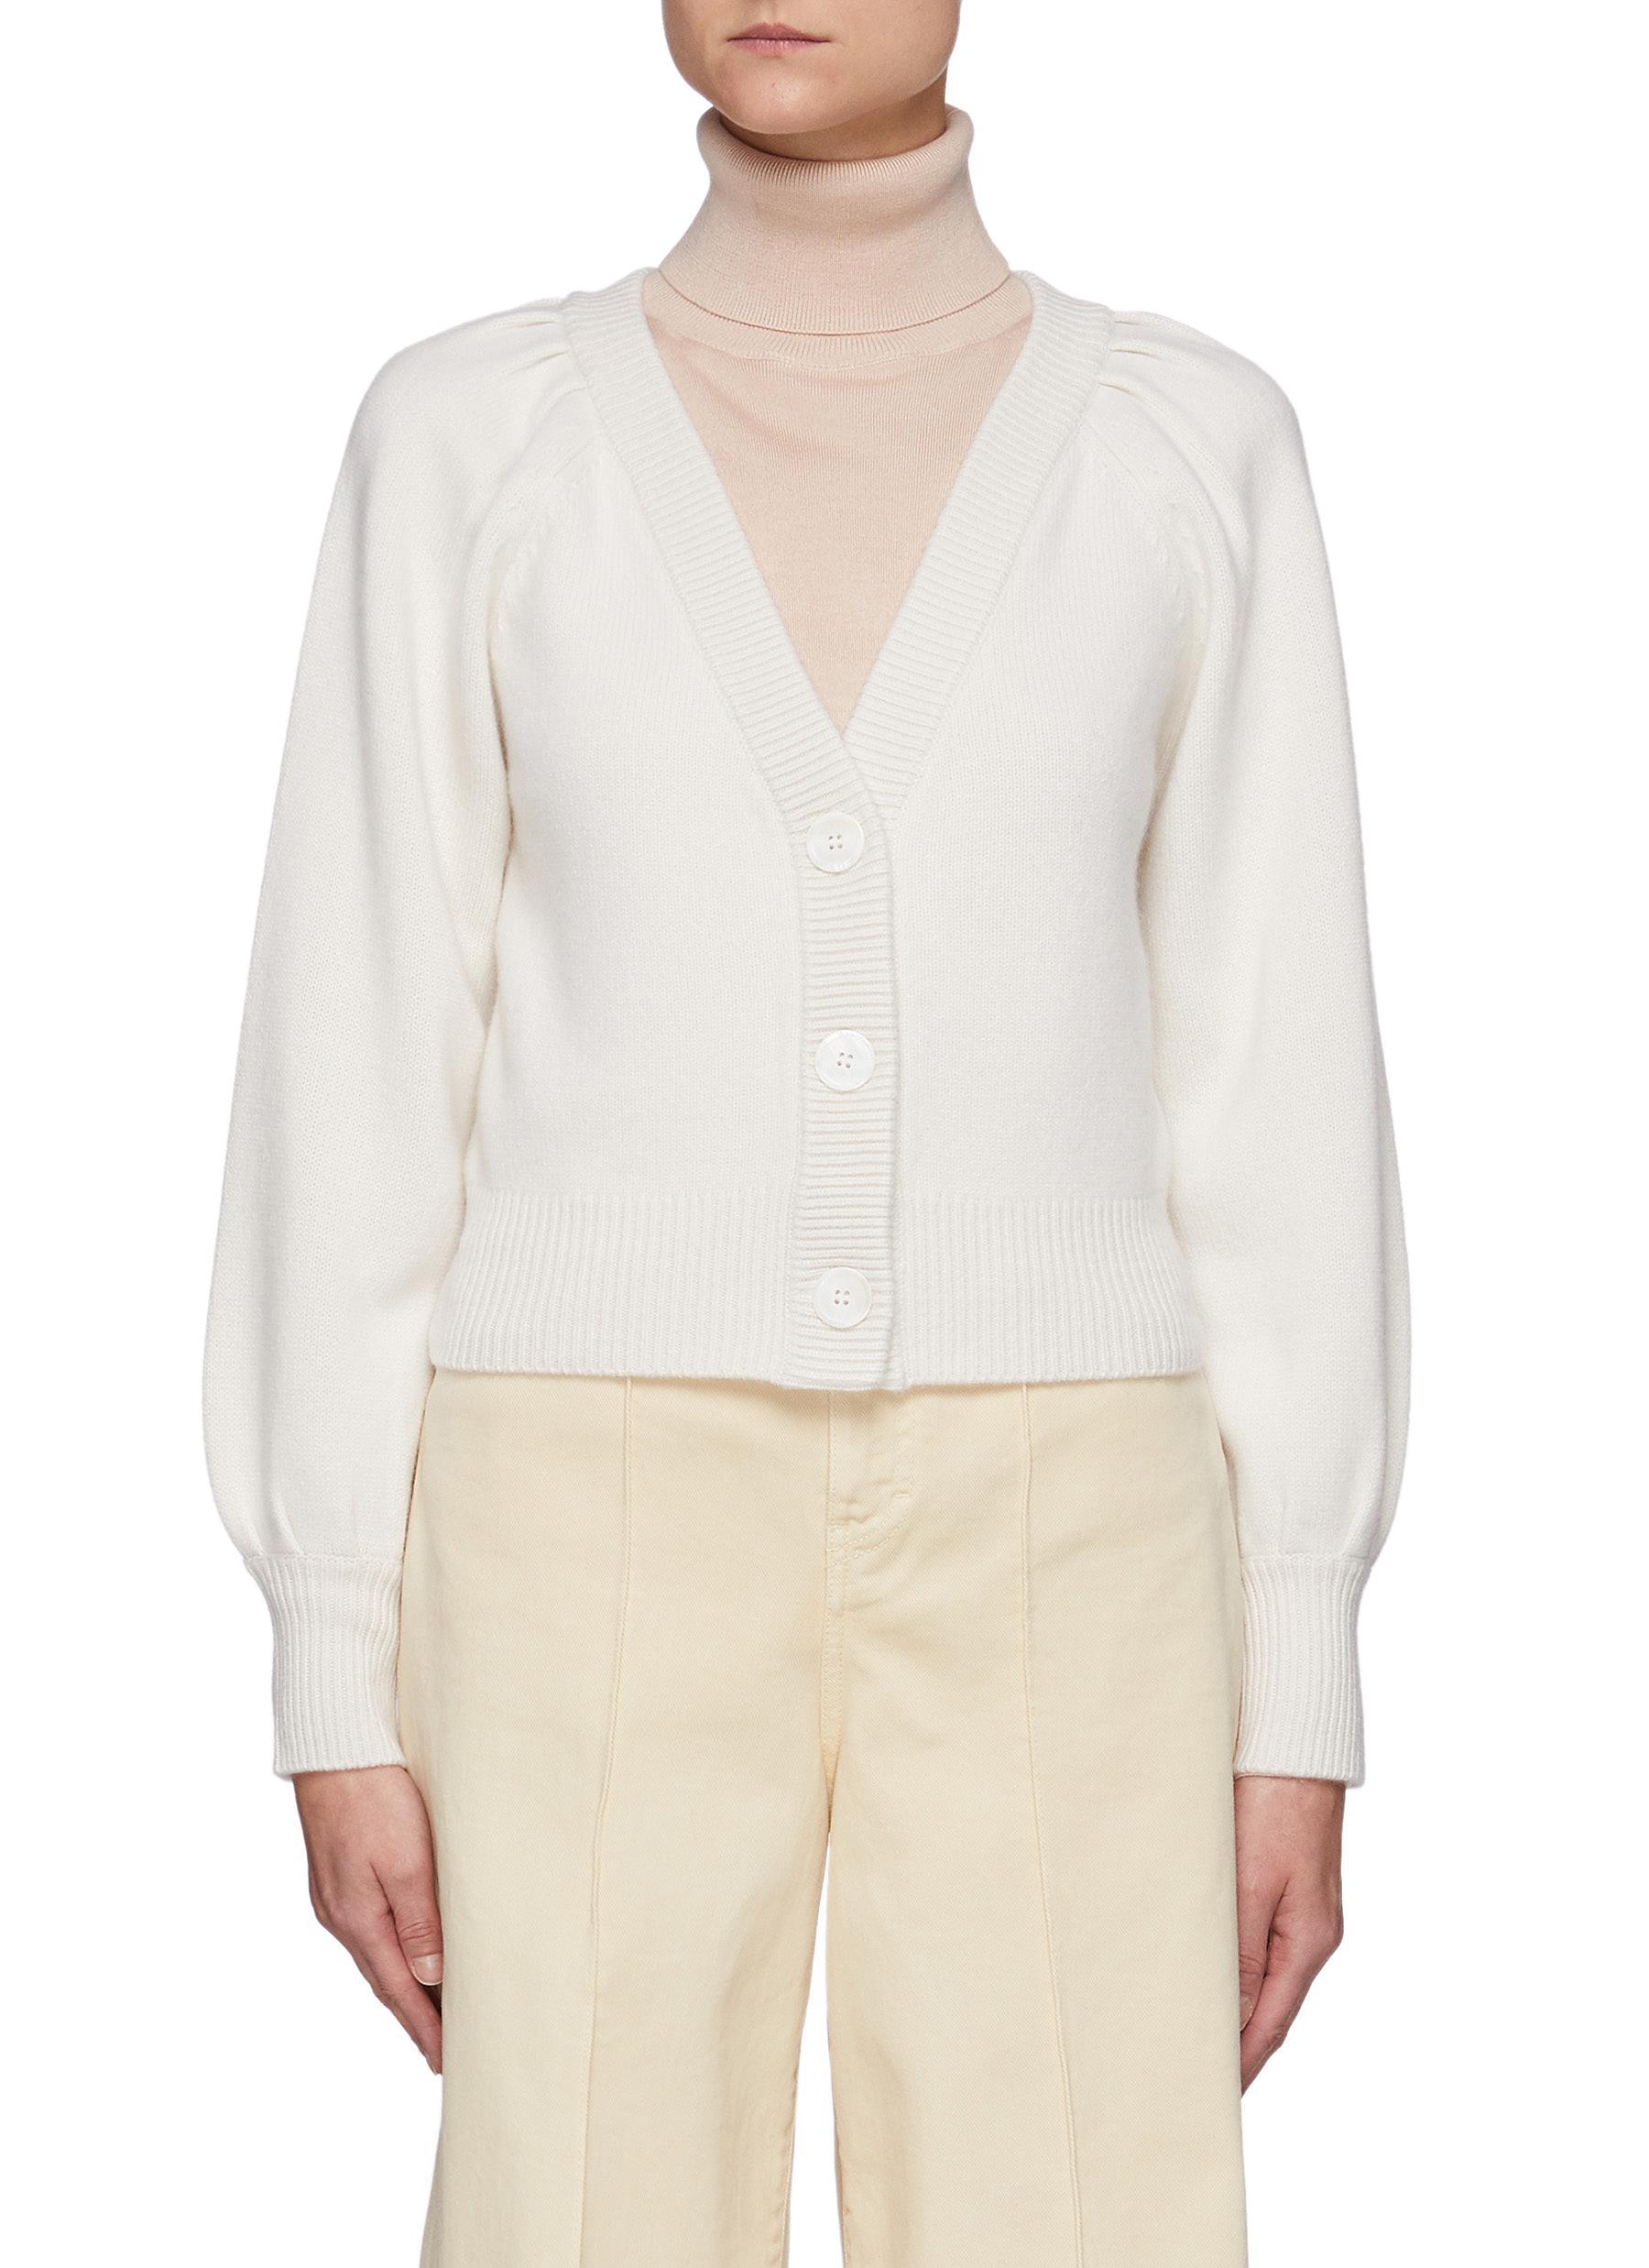 Puffed Sleeve Ribbed Trim Cashmere Cardigan